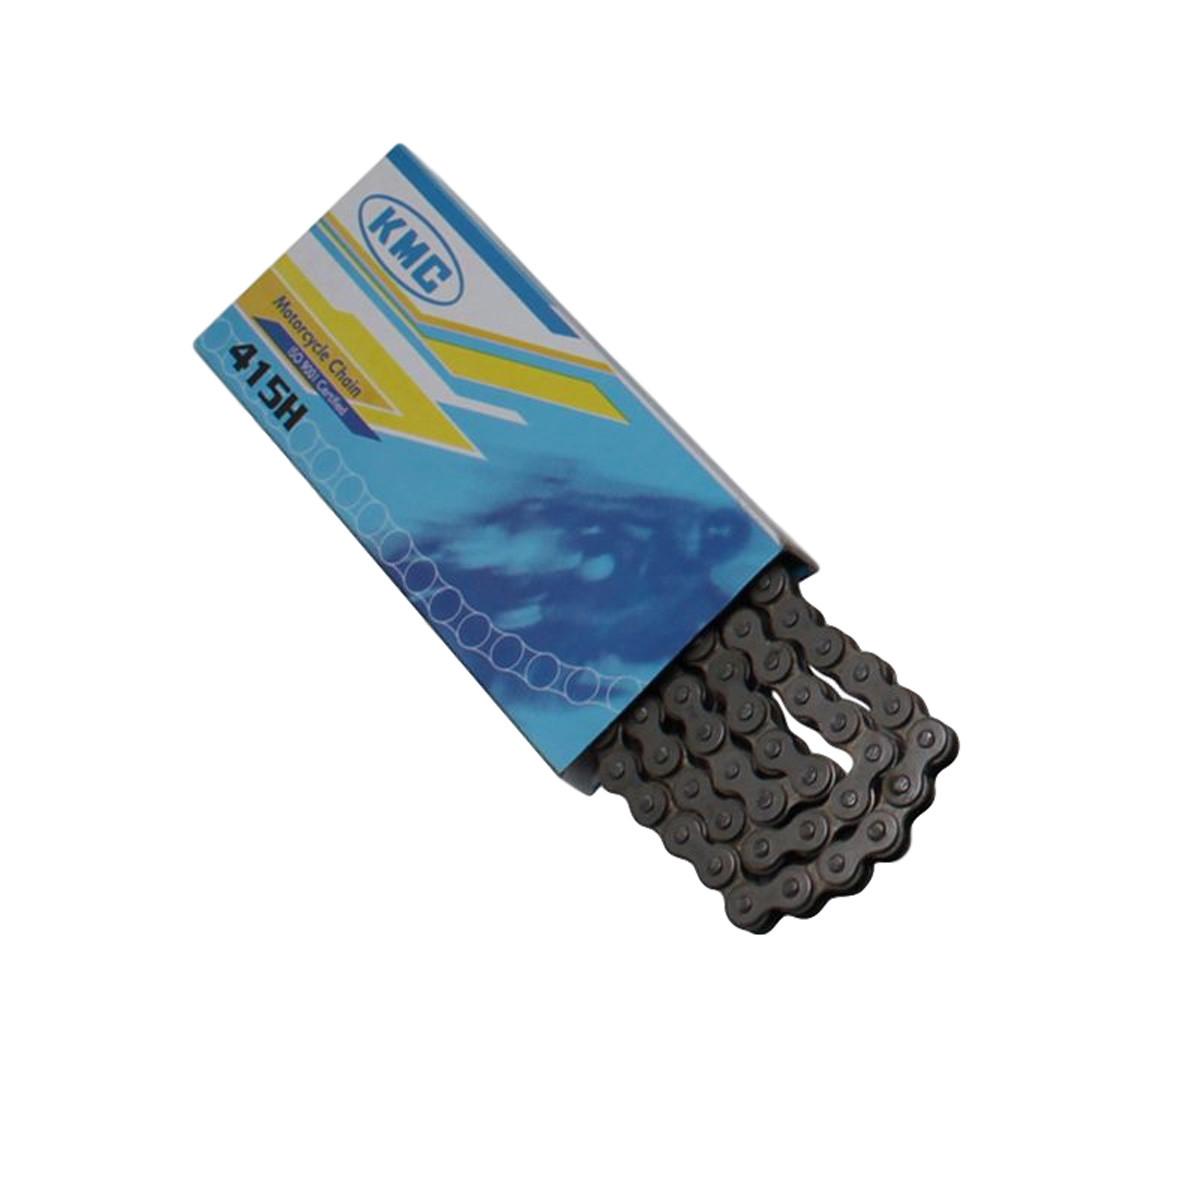 Chaîne 415 106 Maillons - KMC Standard